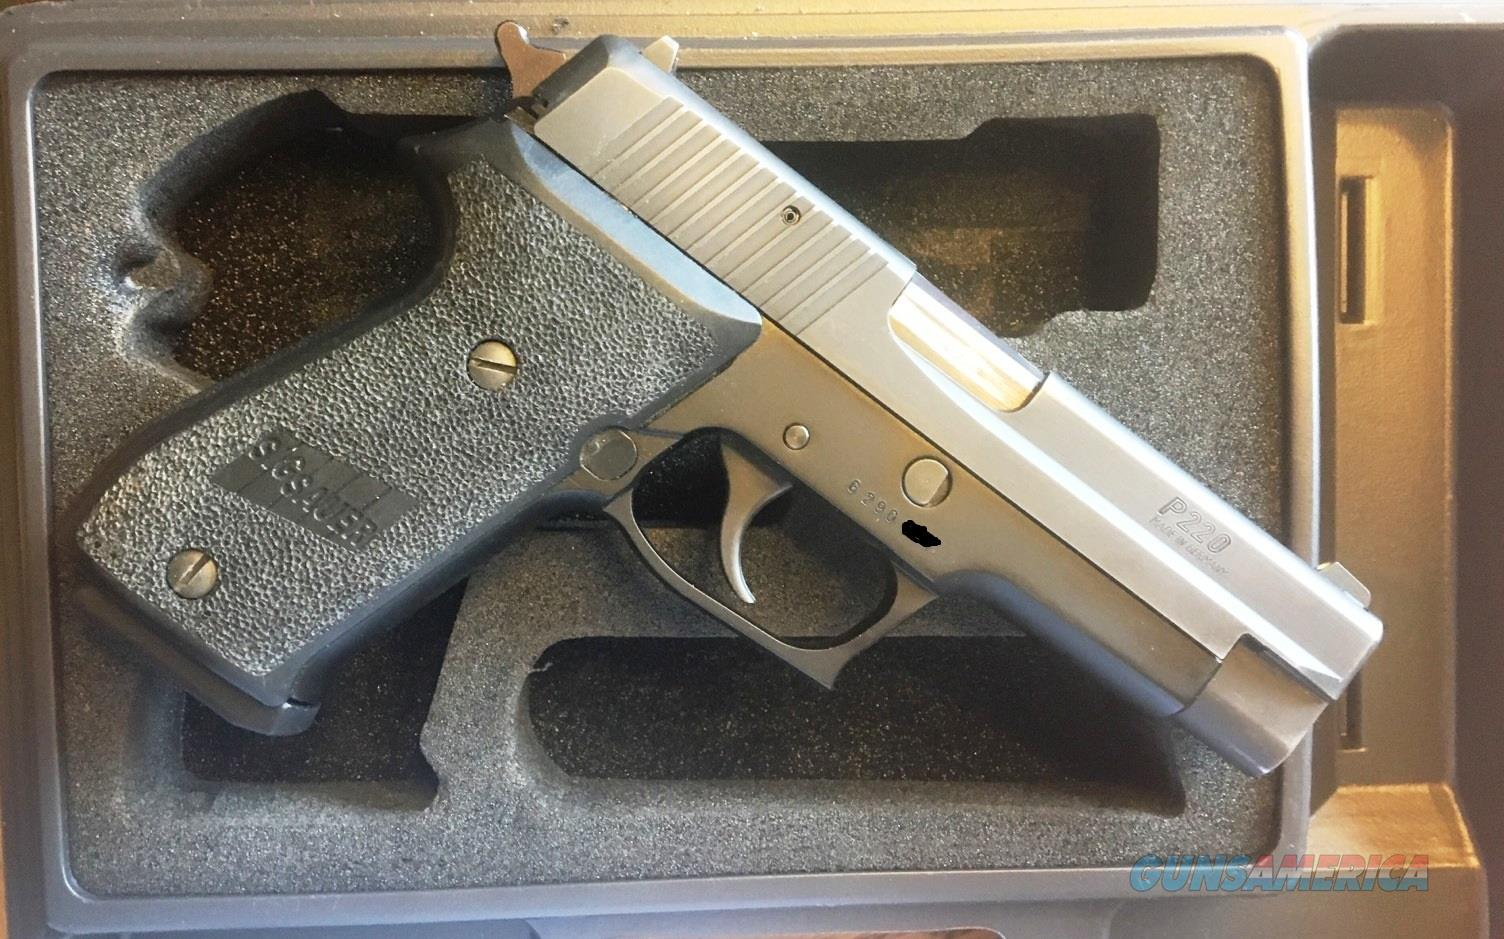 German Sig Arms P220 .45 ACP German Pistol  - SigArms  Guns > Pistols > Sig - Sauer/Sigarms Pistols > P220